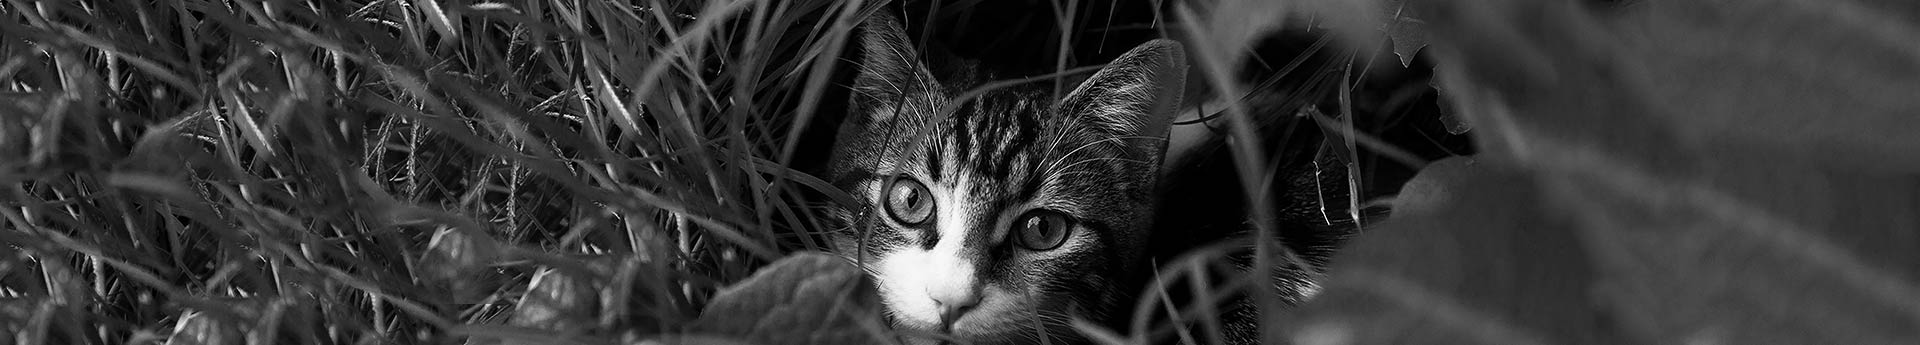 ORIJEN Cat & Kitten Dry Cat Food - Cat stealthily hiding in grass - Binx from Surprise, Arizona